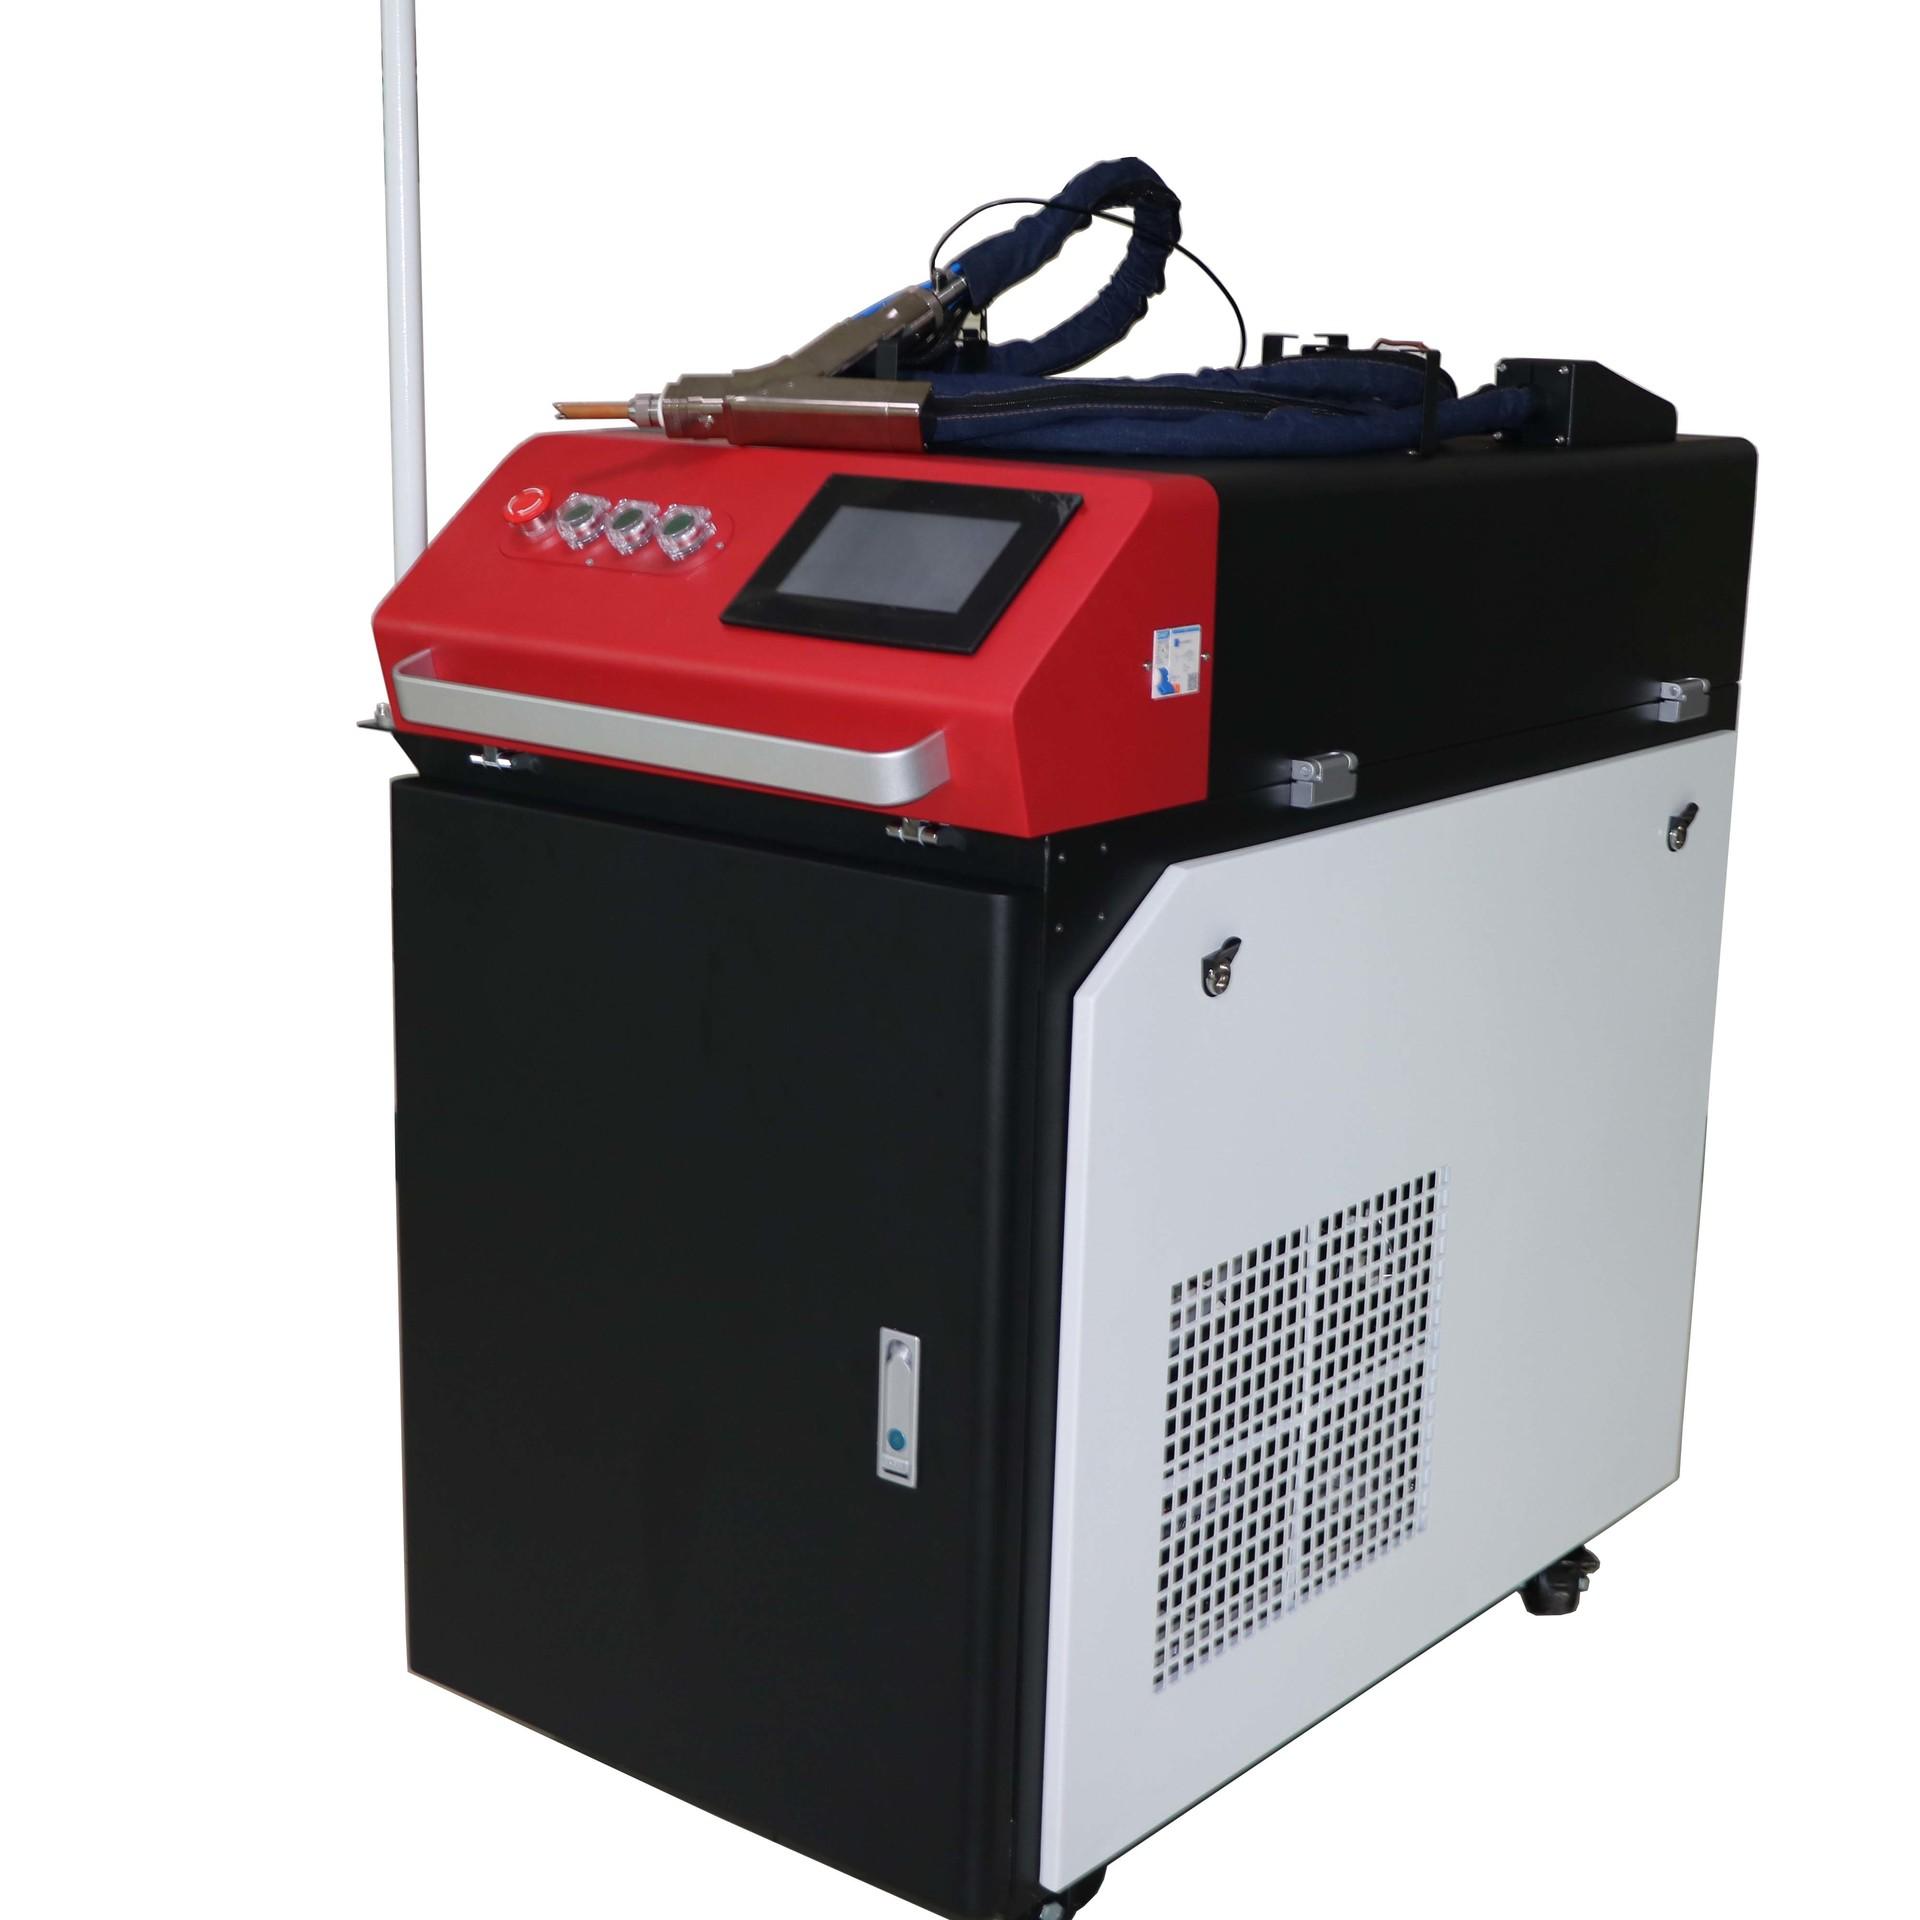 Handheld fiber laser welding machine